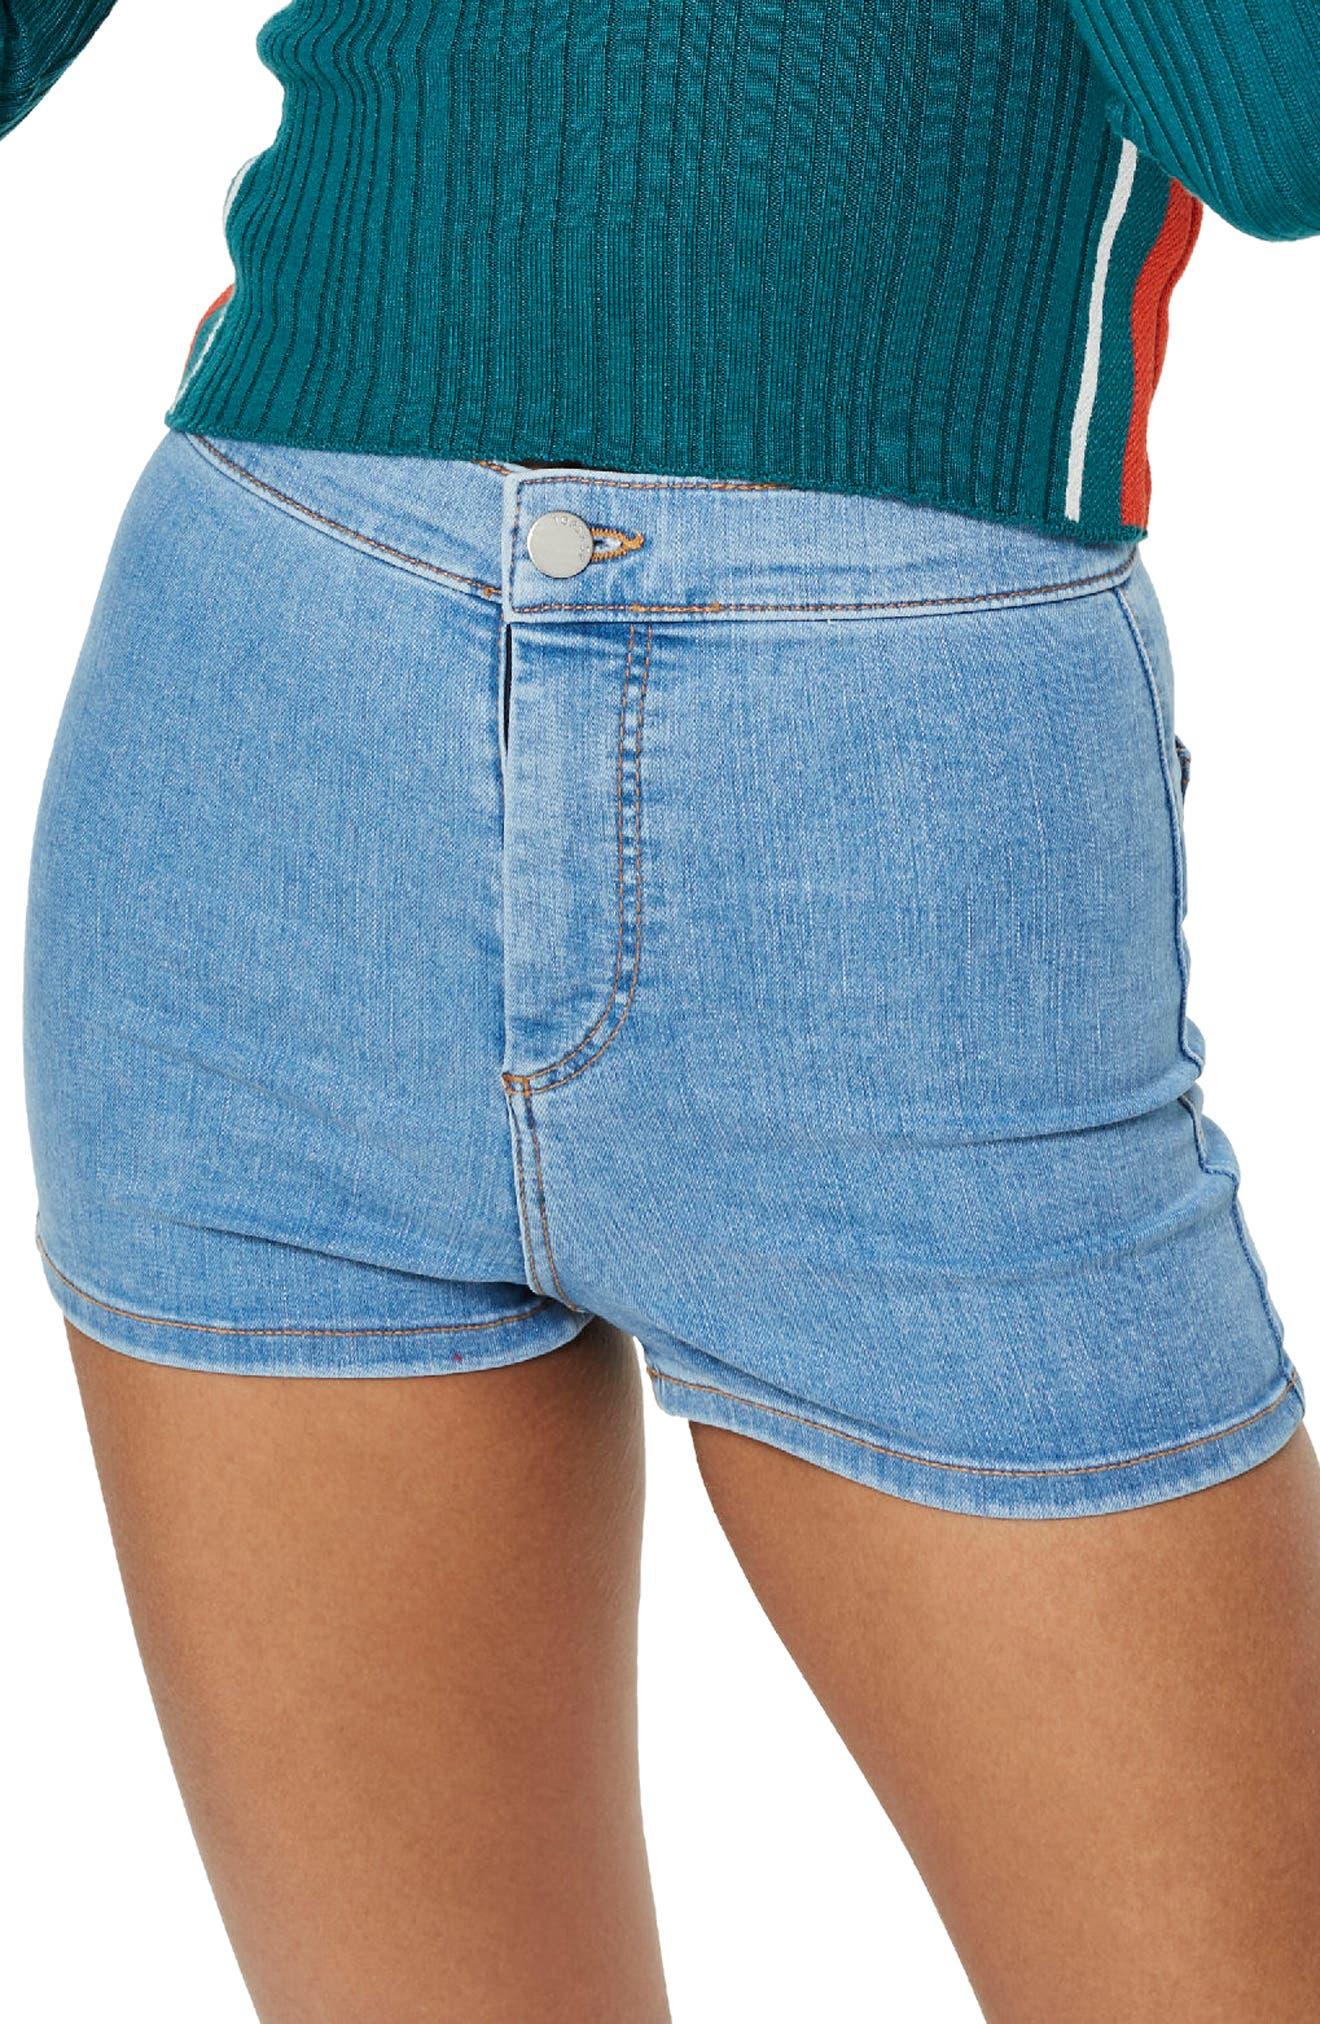 Main Image - Topshop Joni Light Denim High Waist Shorts